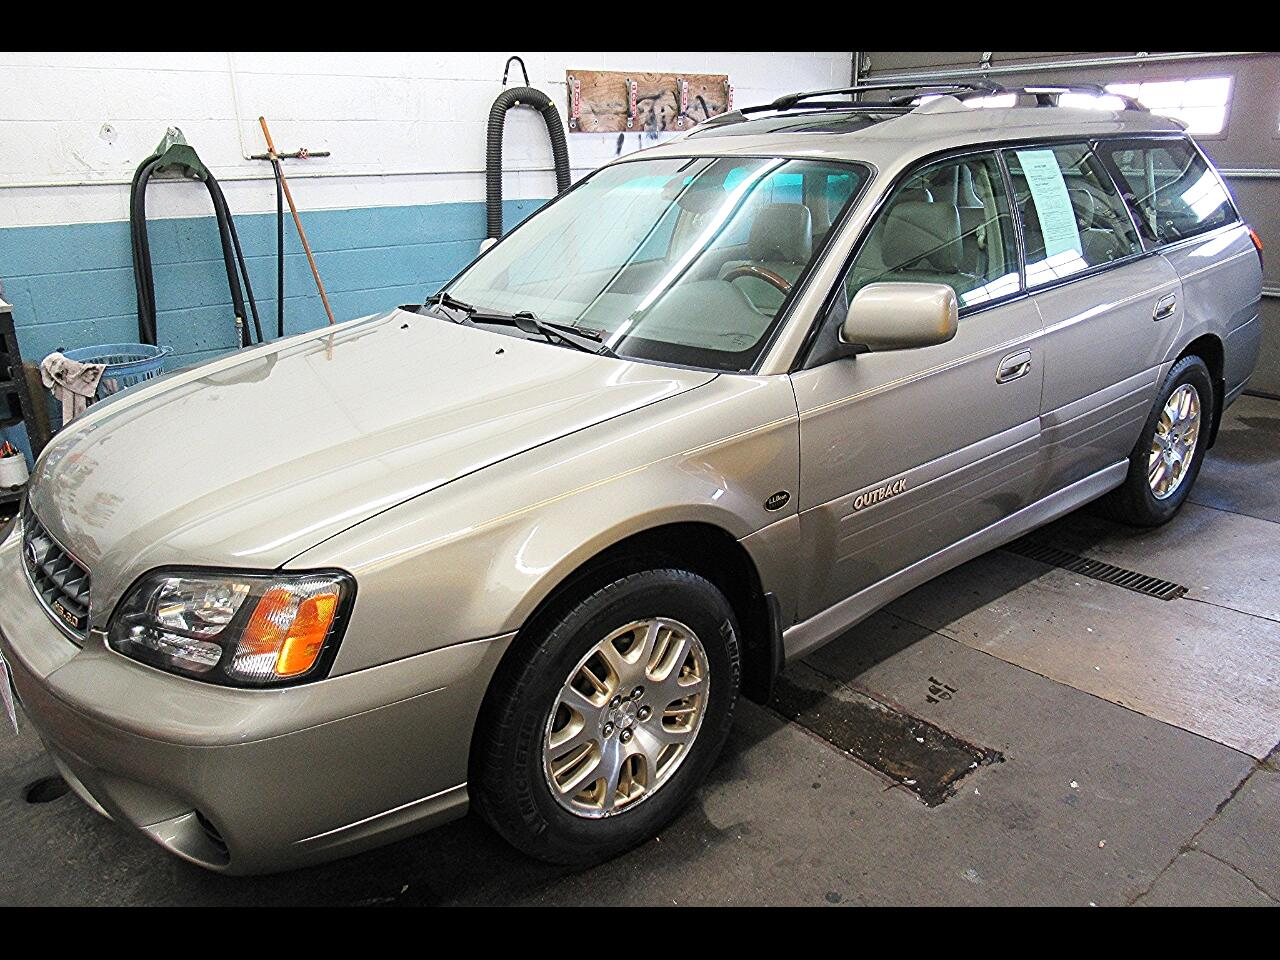 Subaru Outback H6-3.0 L.L. Bean Edition Wagon 2003